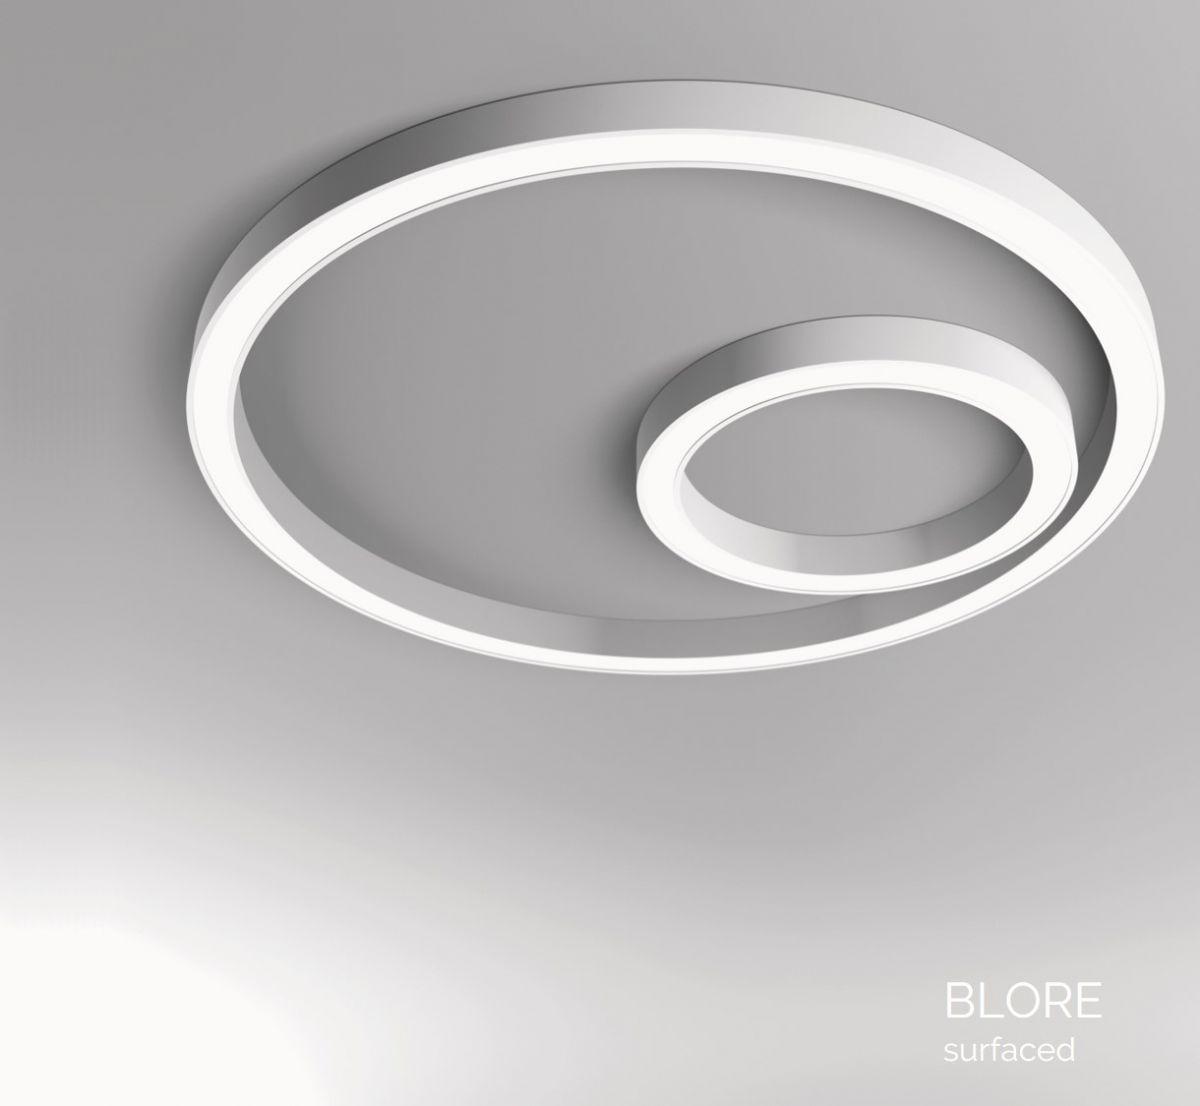 blore 111 surfaced luminaire round 1500mm 4000k 11308lm 140w dali